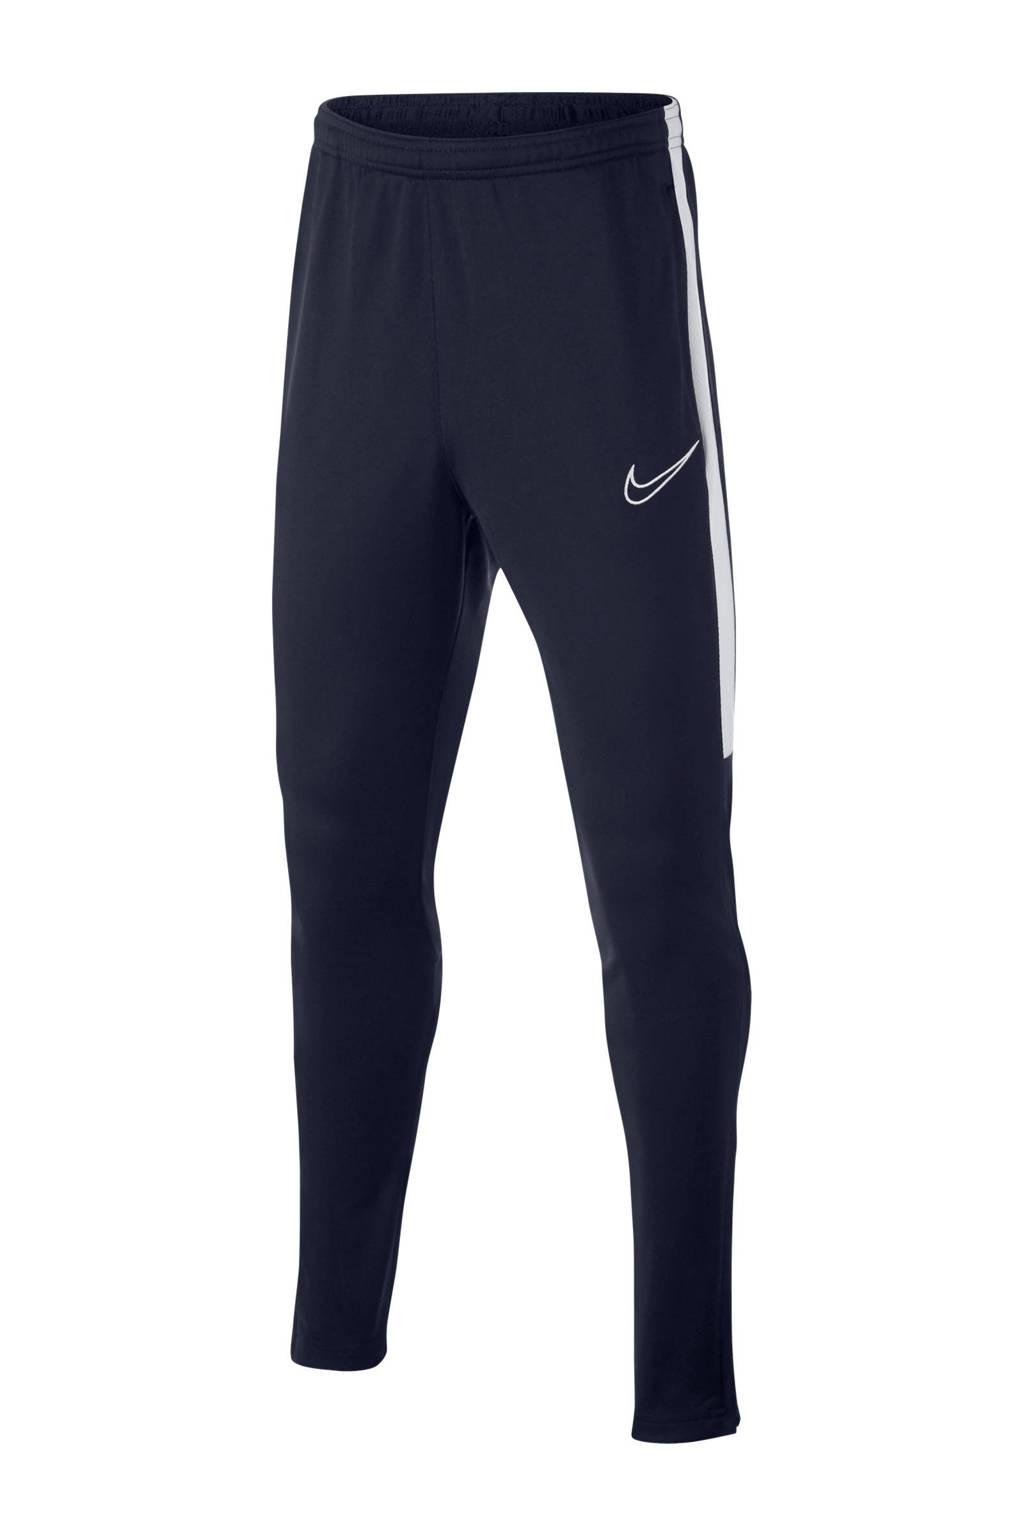 Nike Junior  voetbalbroek donkerblauw, Donkerblauw